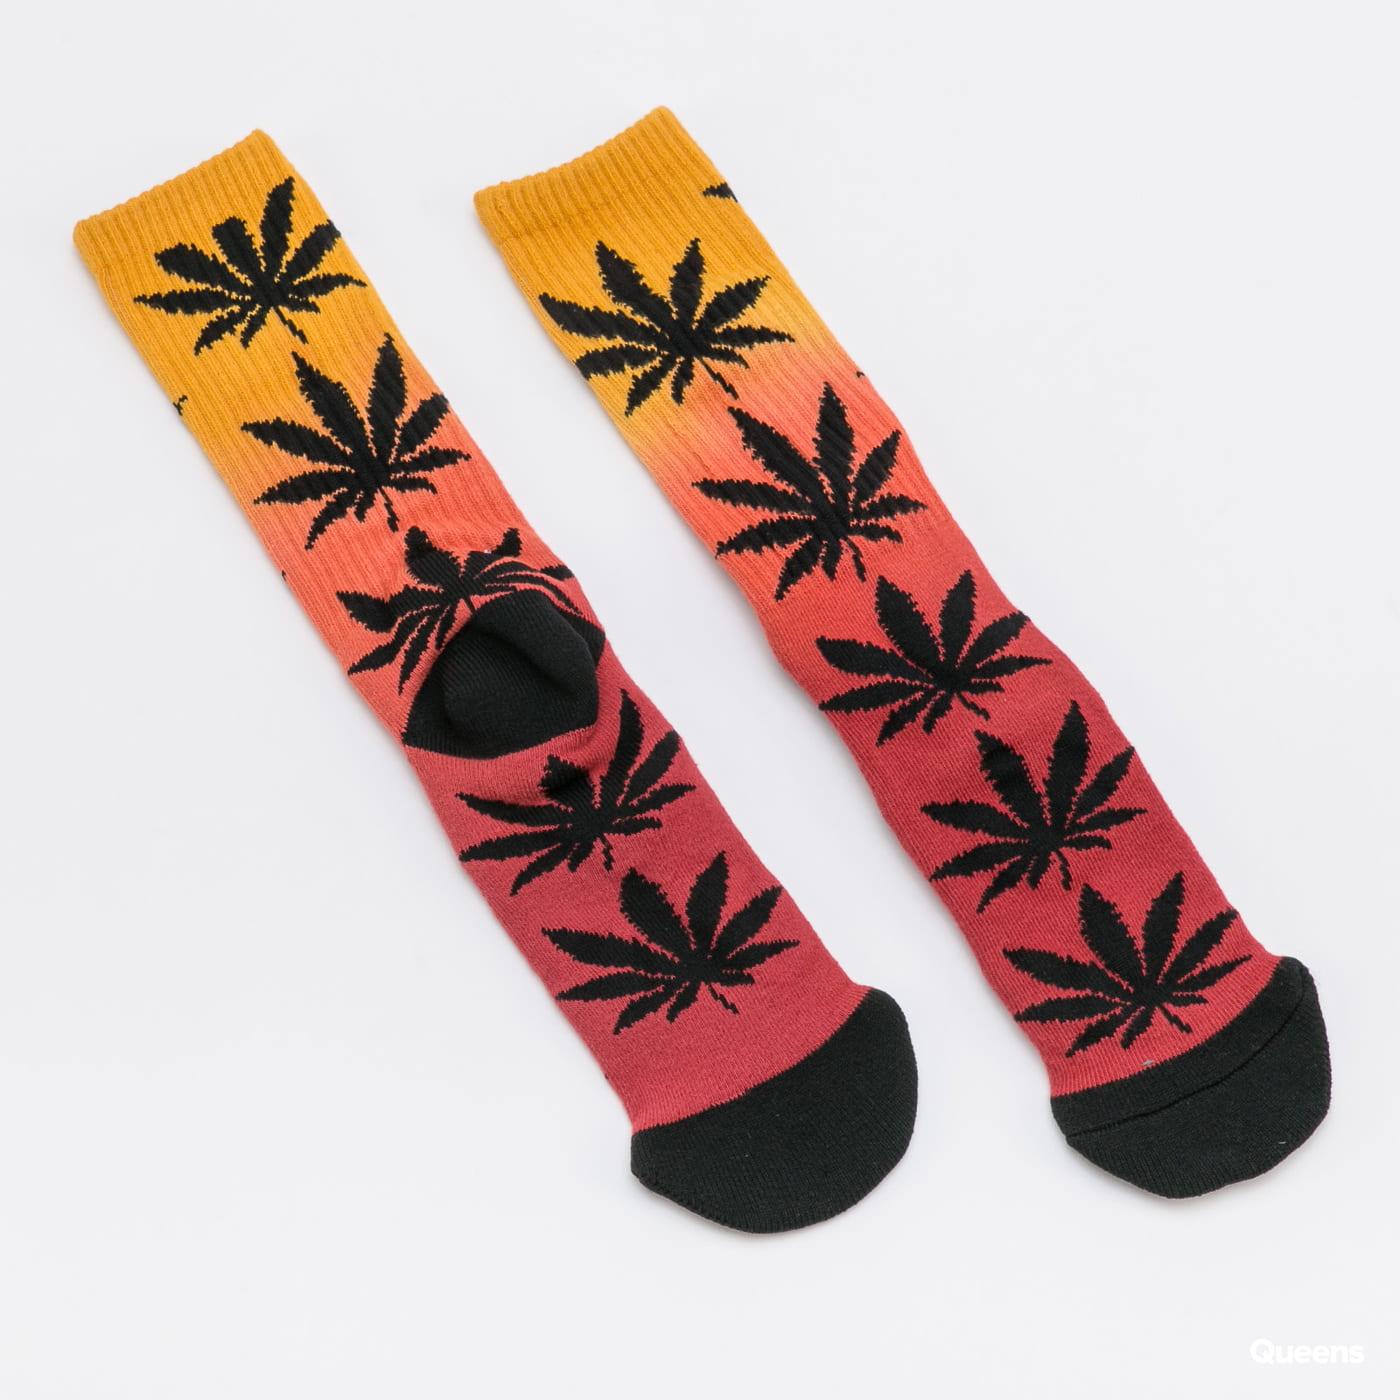 HUF Plantlife Gradient Dye Socks dark red / dark yellow / black